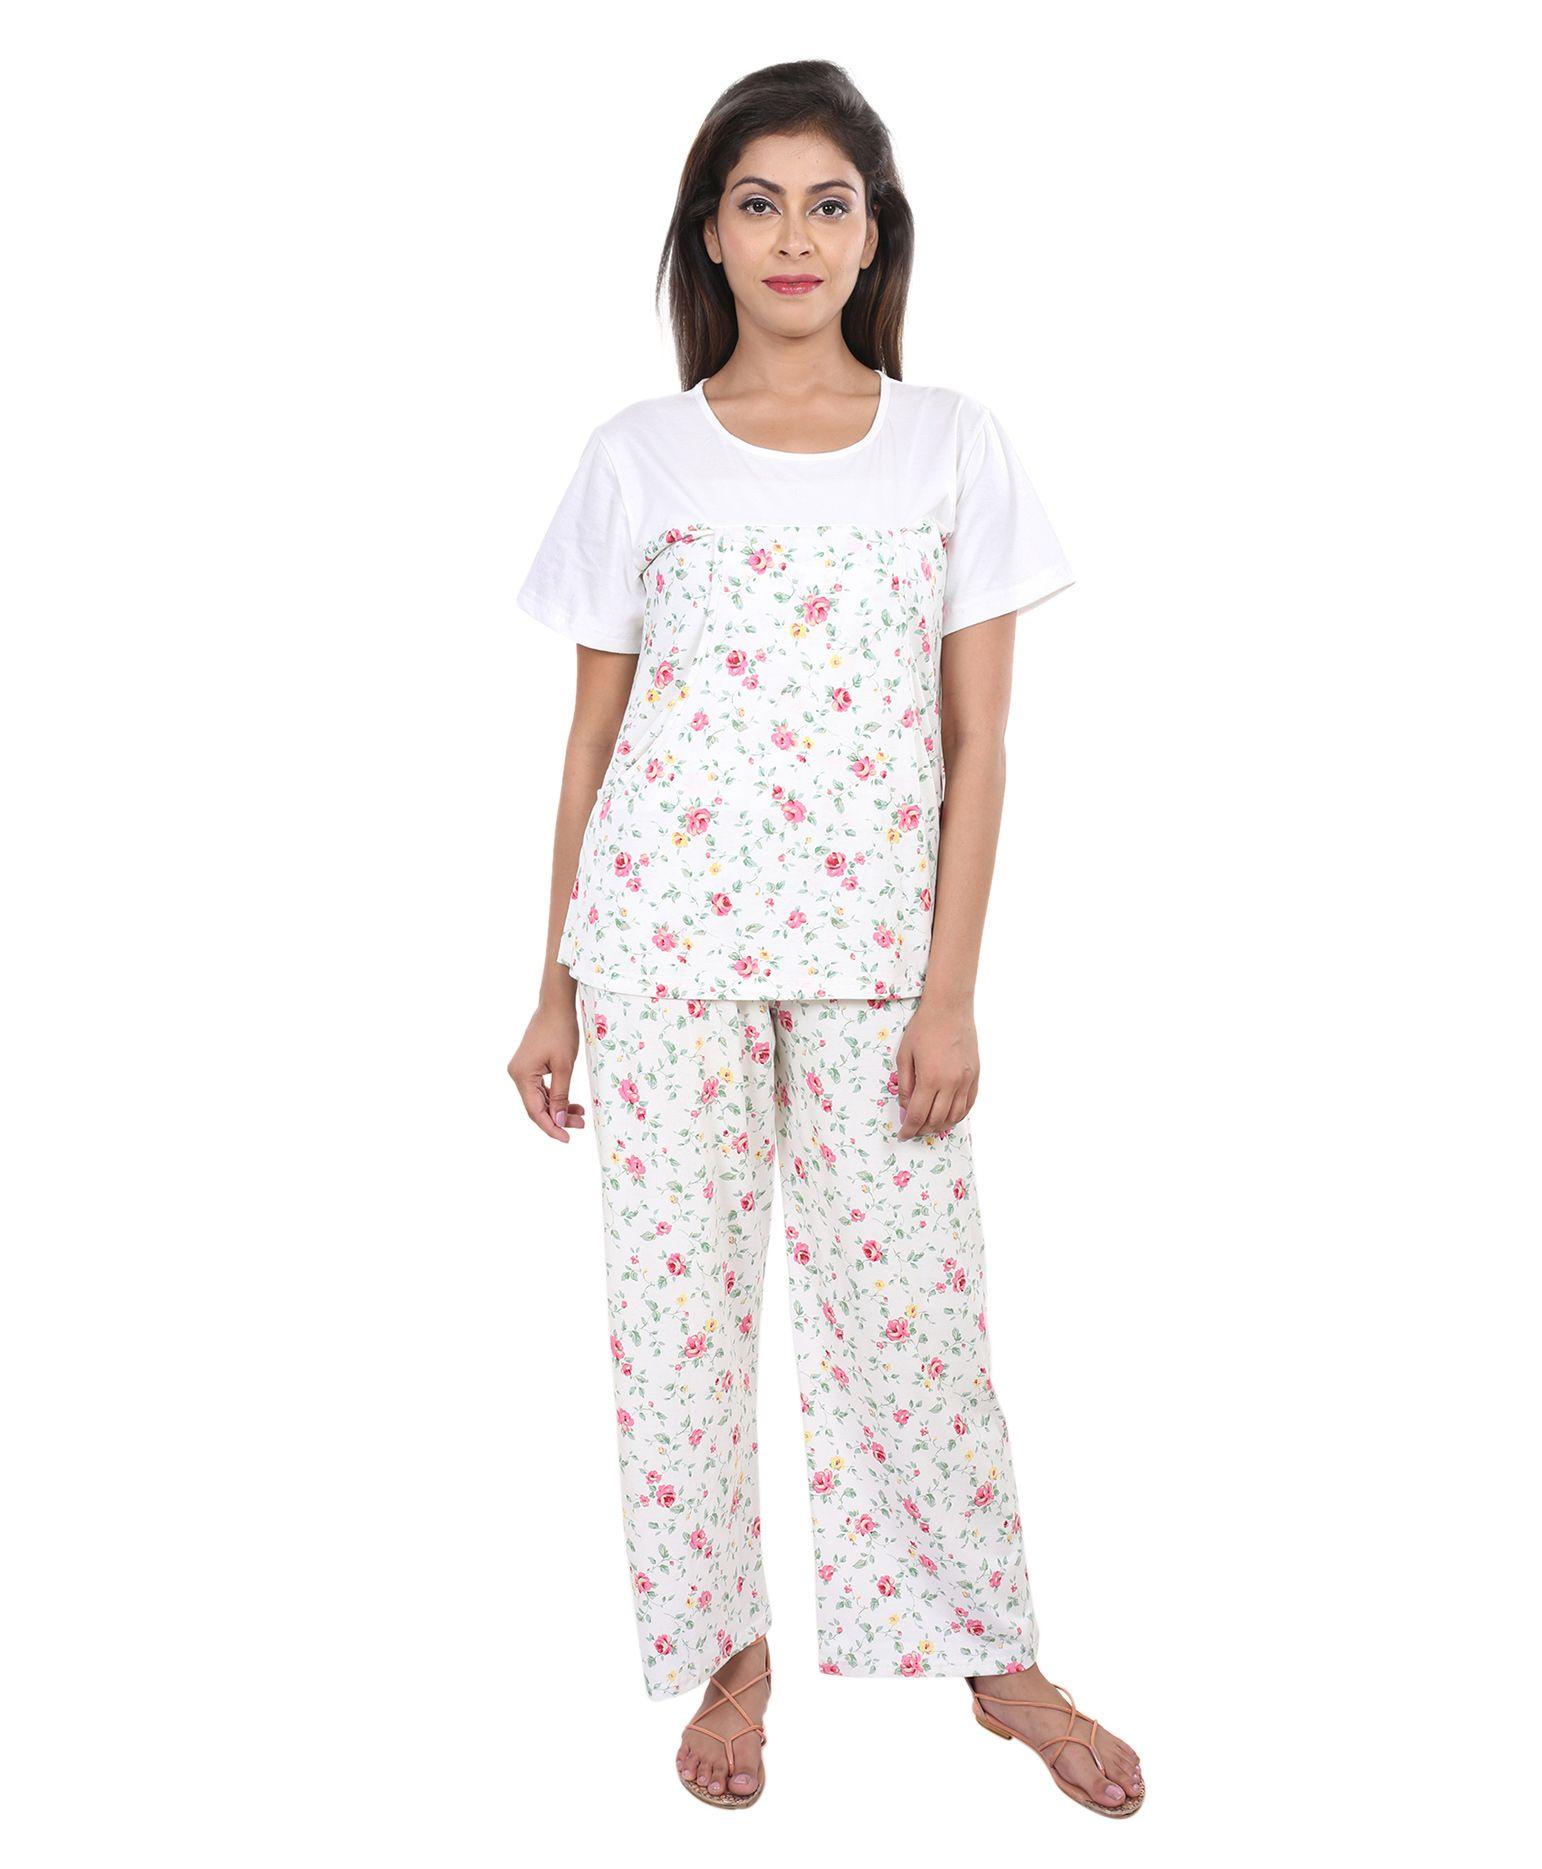 fe6da2abfe5f4 9teenAGAIN Floral Print Nursing Night Suit Set White Online in India ...